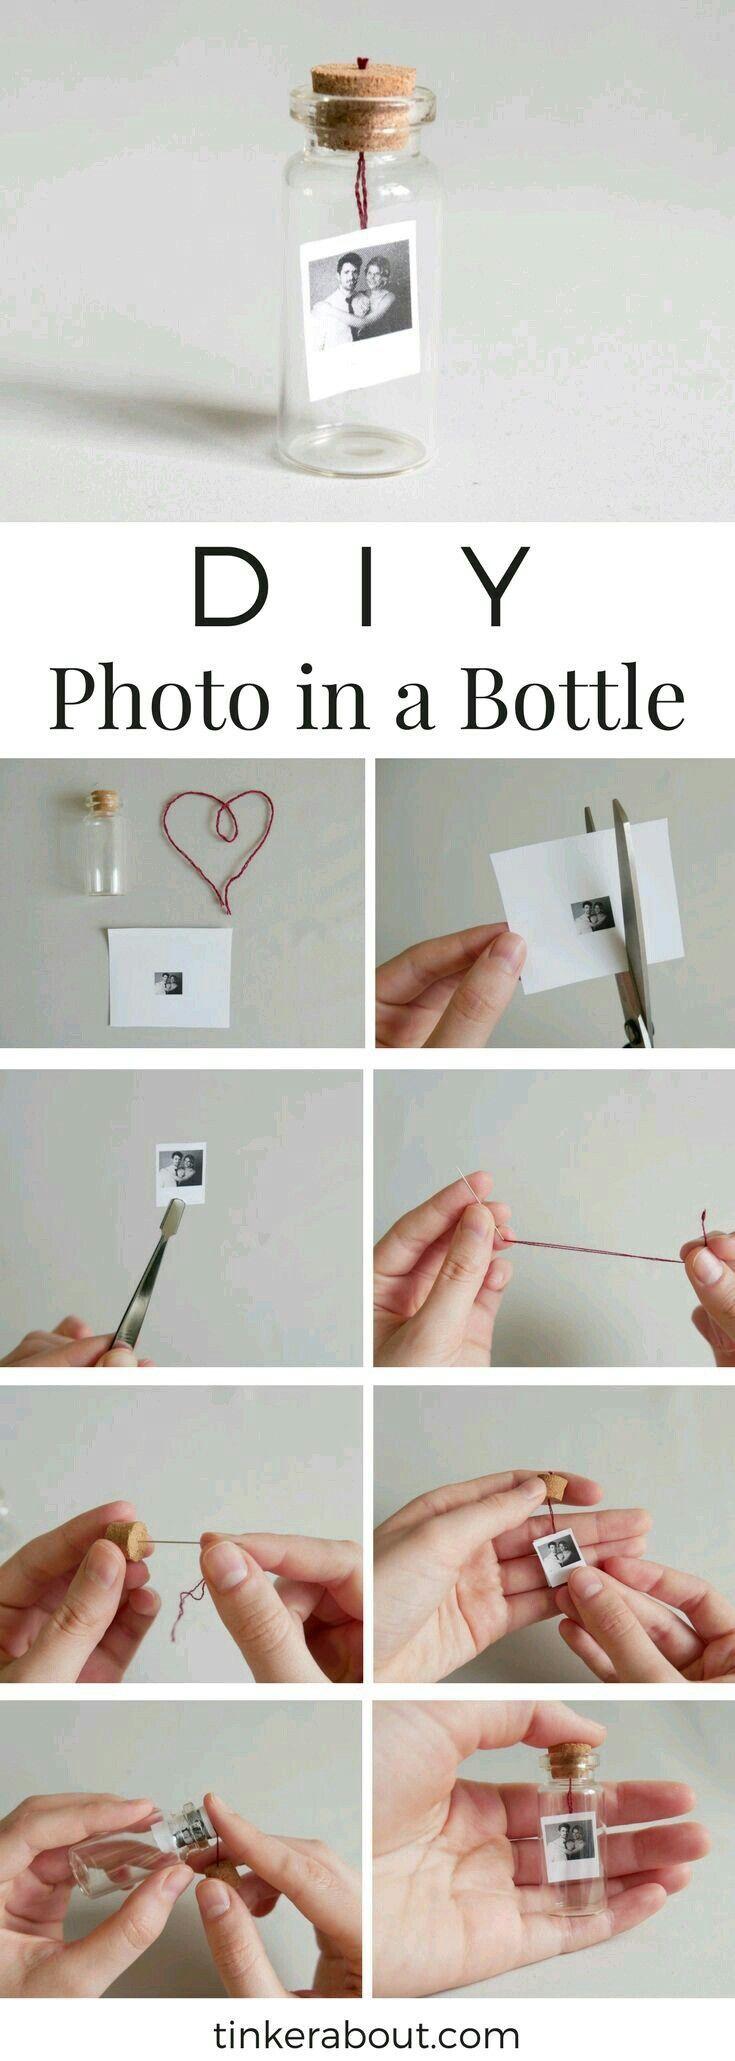 Fotogeschenke selber machen